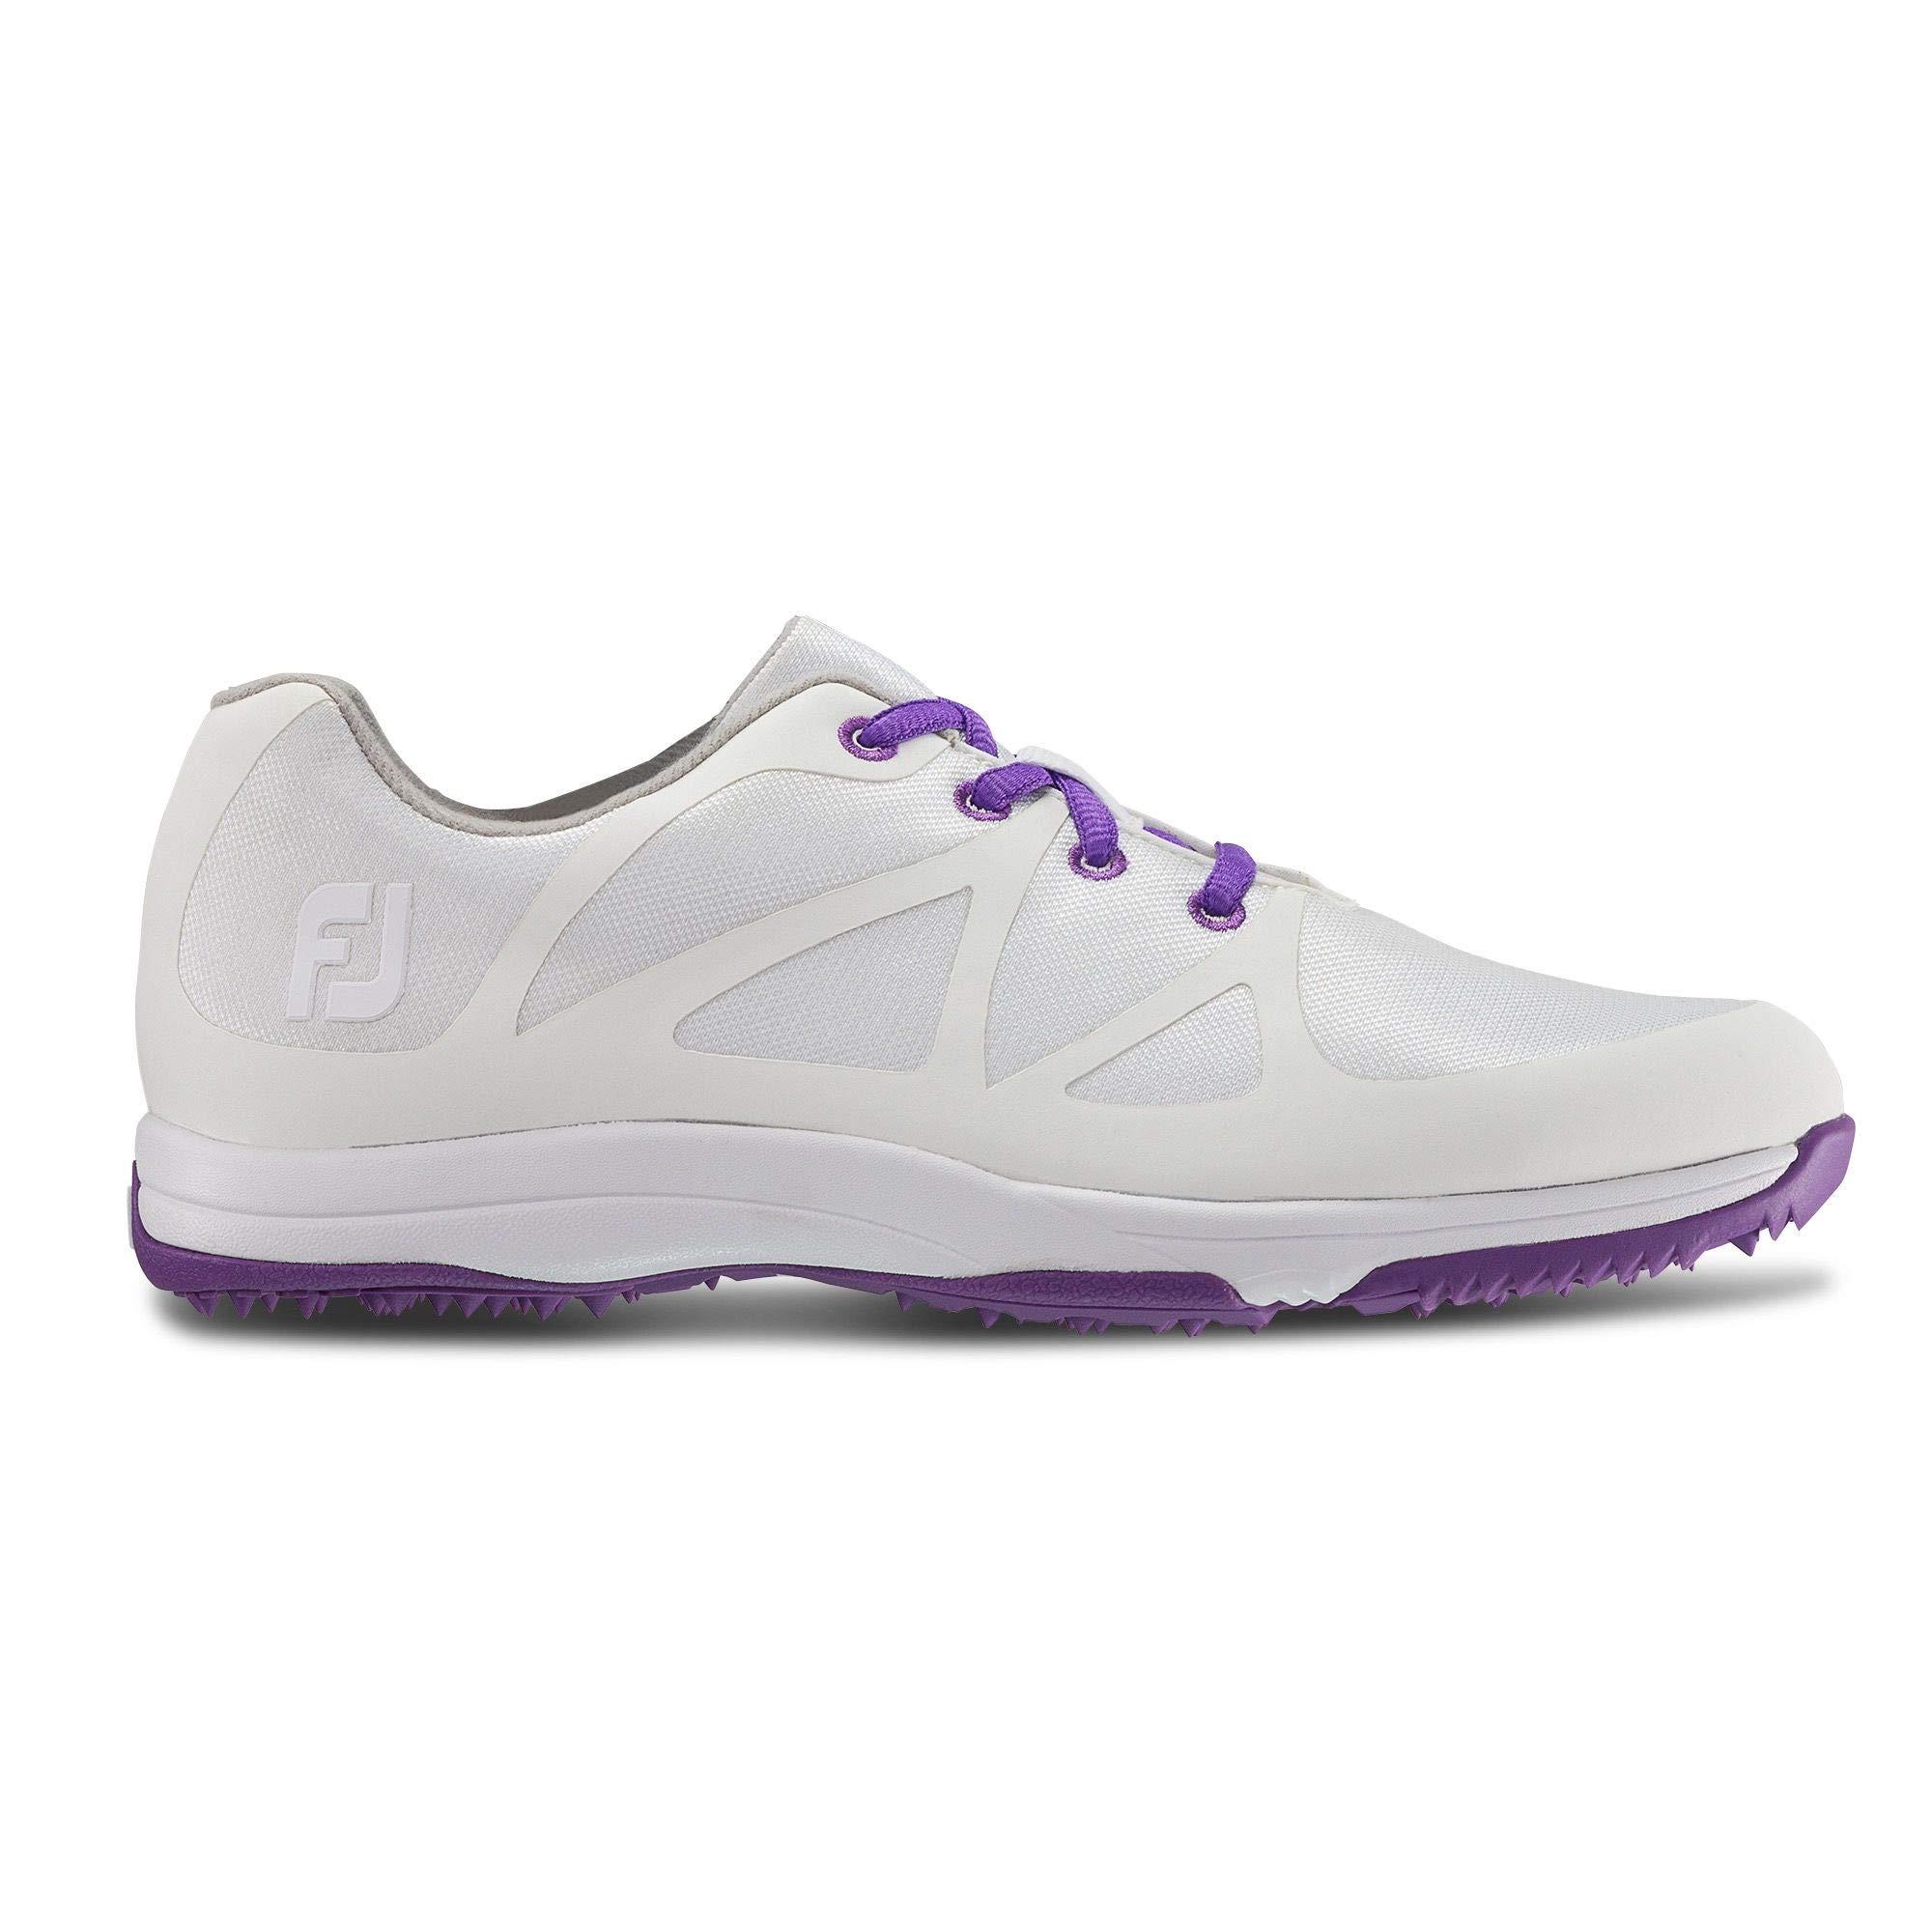 FootJoy Women's Leisure-Previous Season Style Golf Shoes White 5 M Purple, US